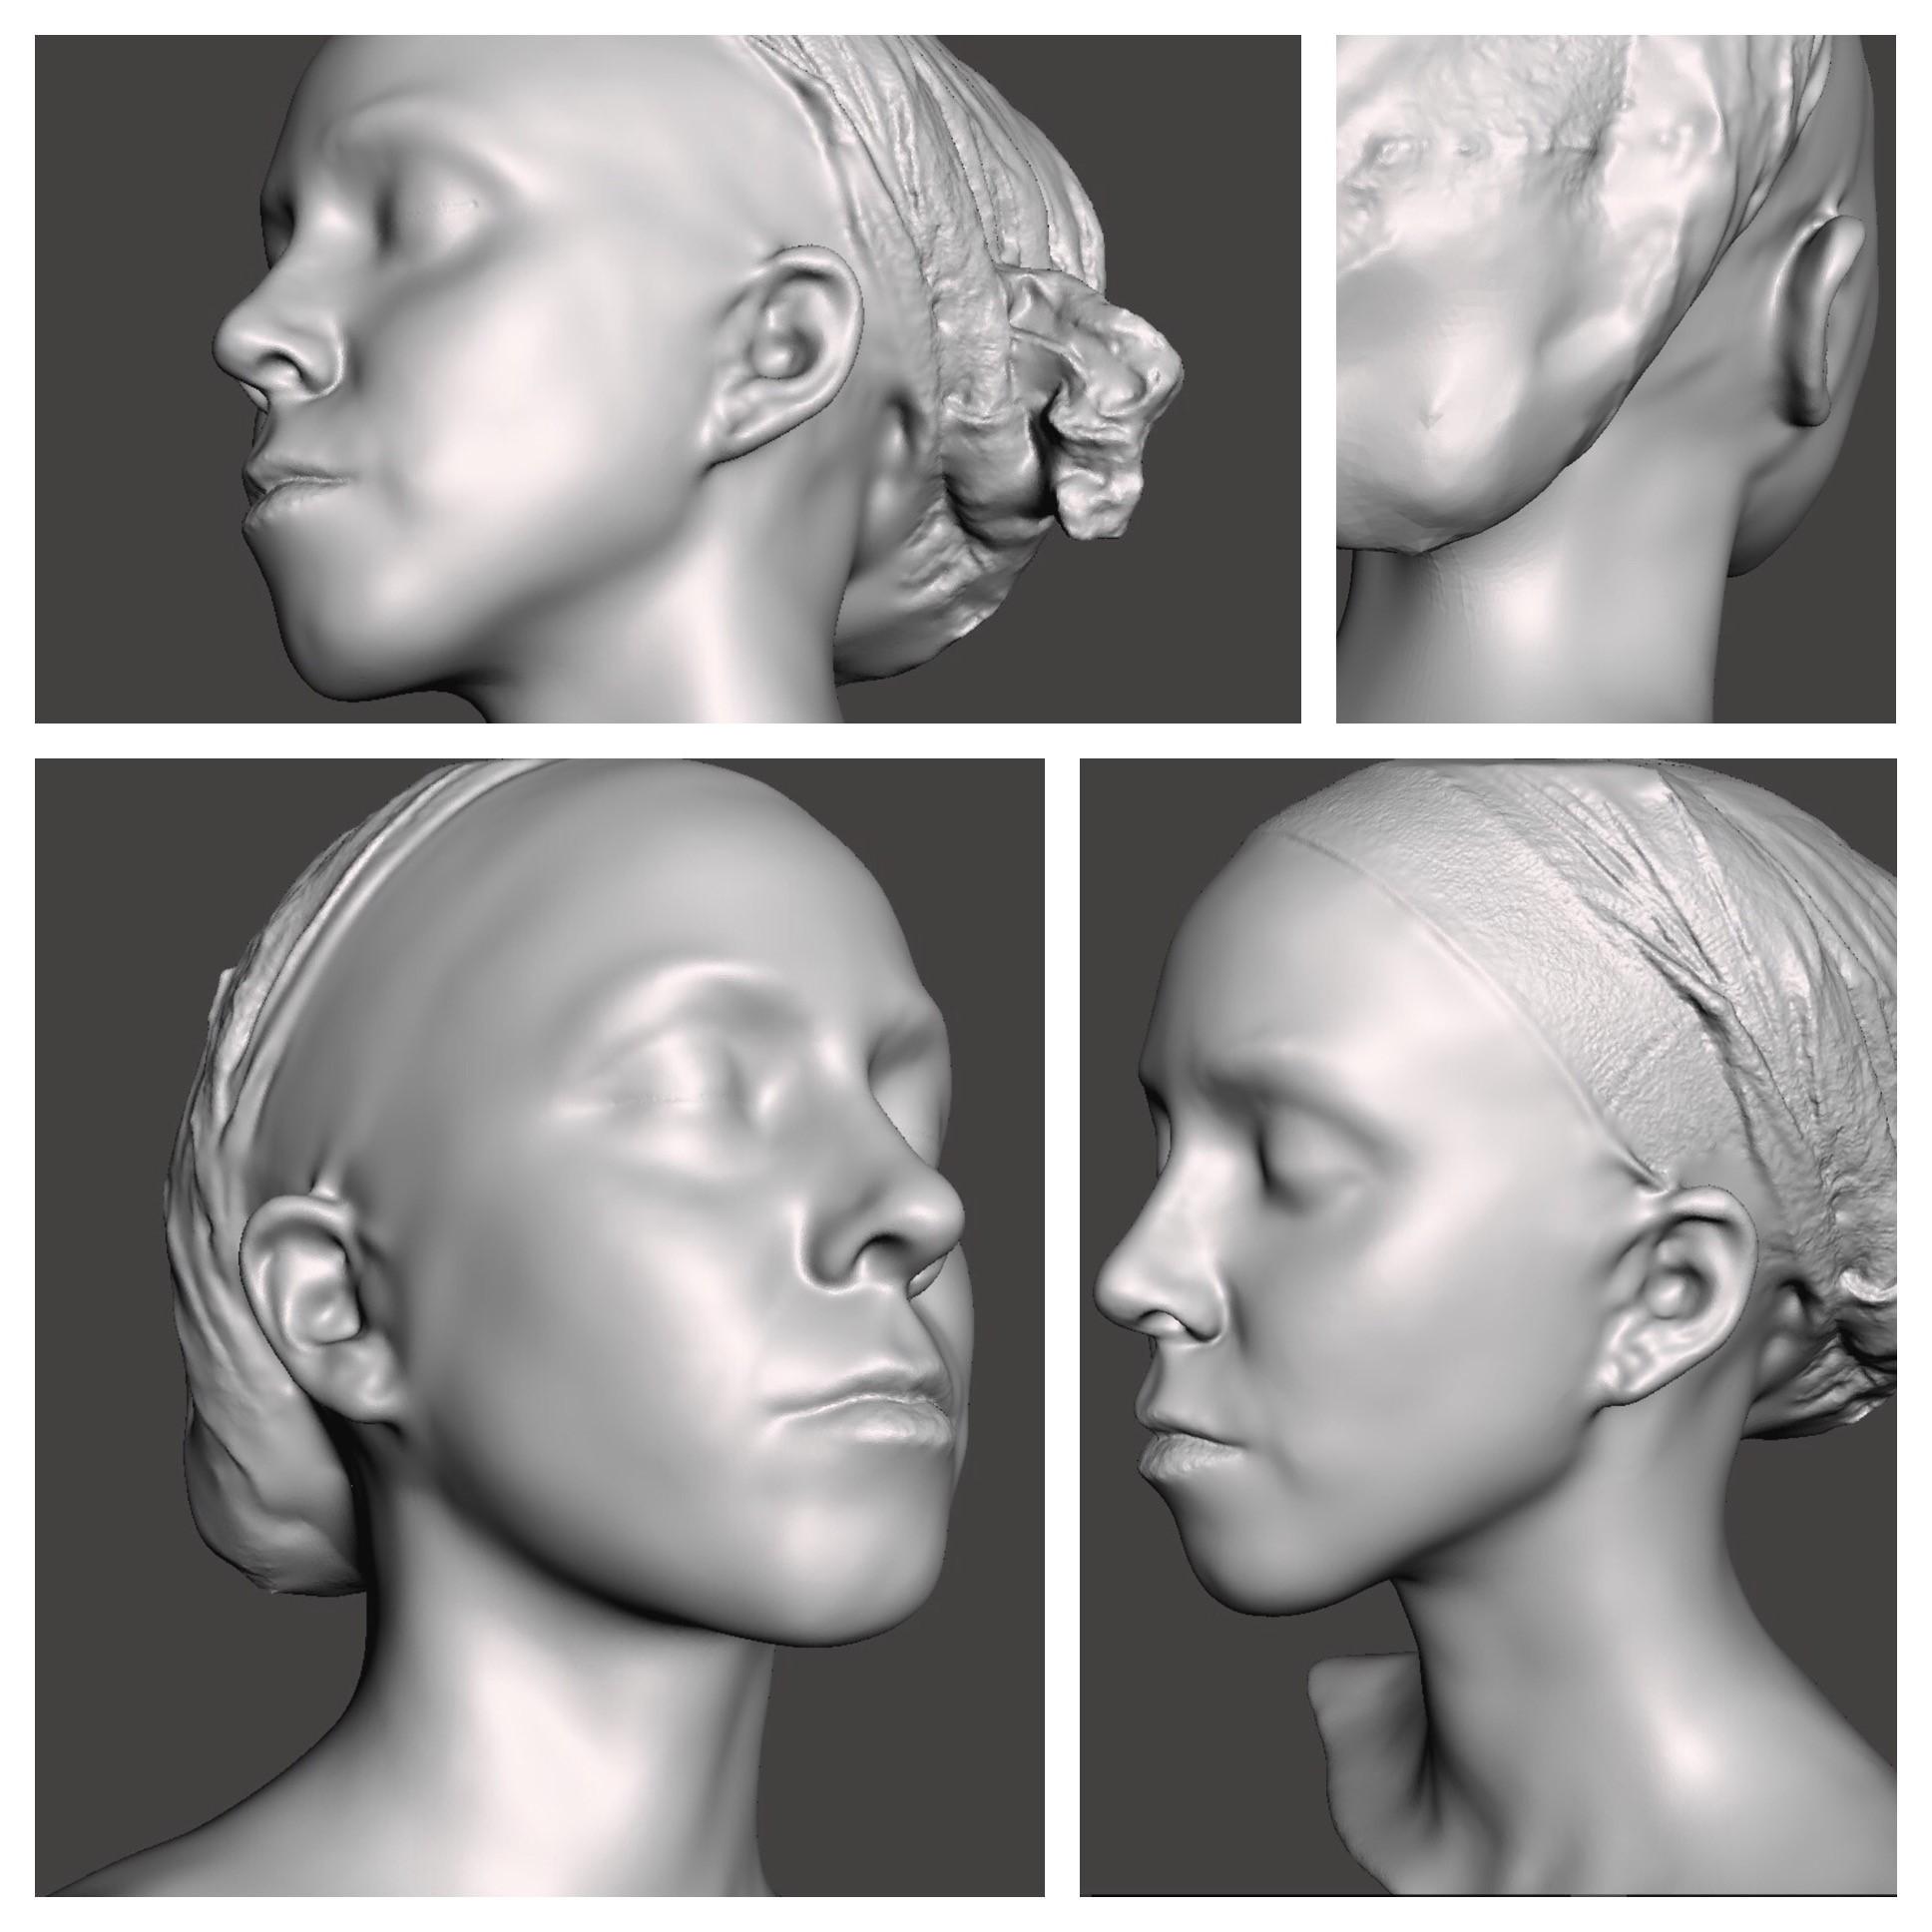 Digital 3D Portraits1.jpg